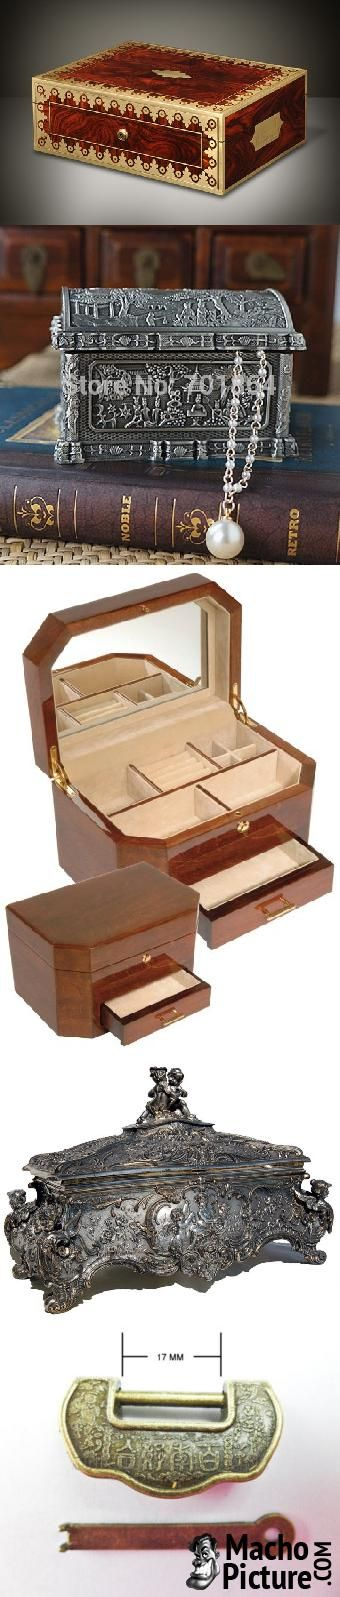 Vintage style jewellery box - 6 PHOTO!